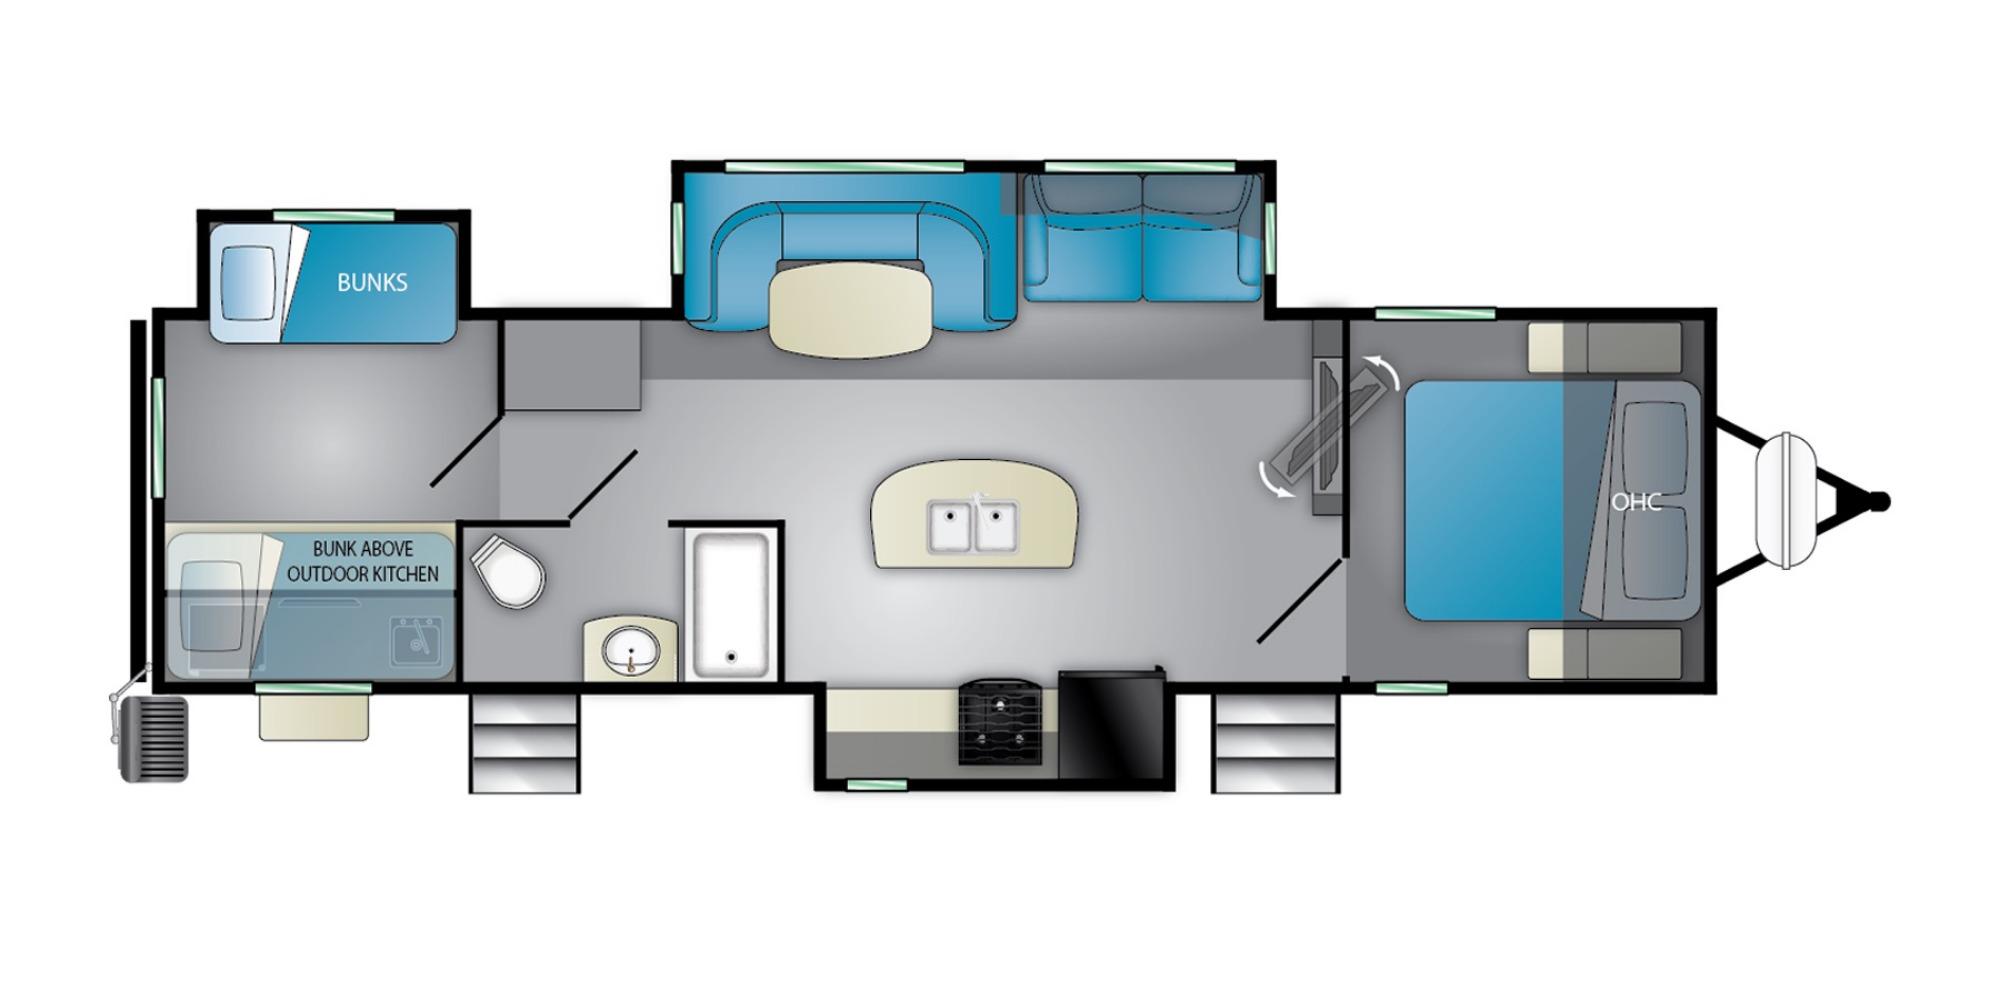 View Floor Plan for 2022 HEARTLAND MALLARD M33